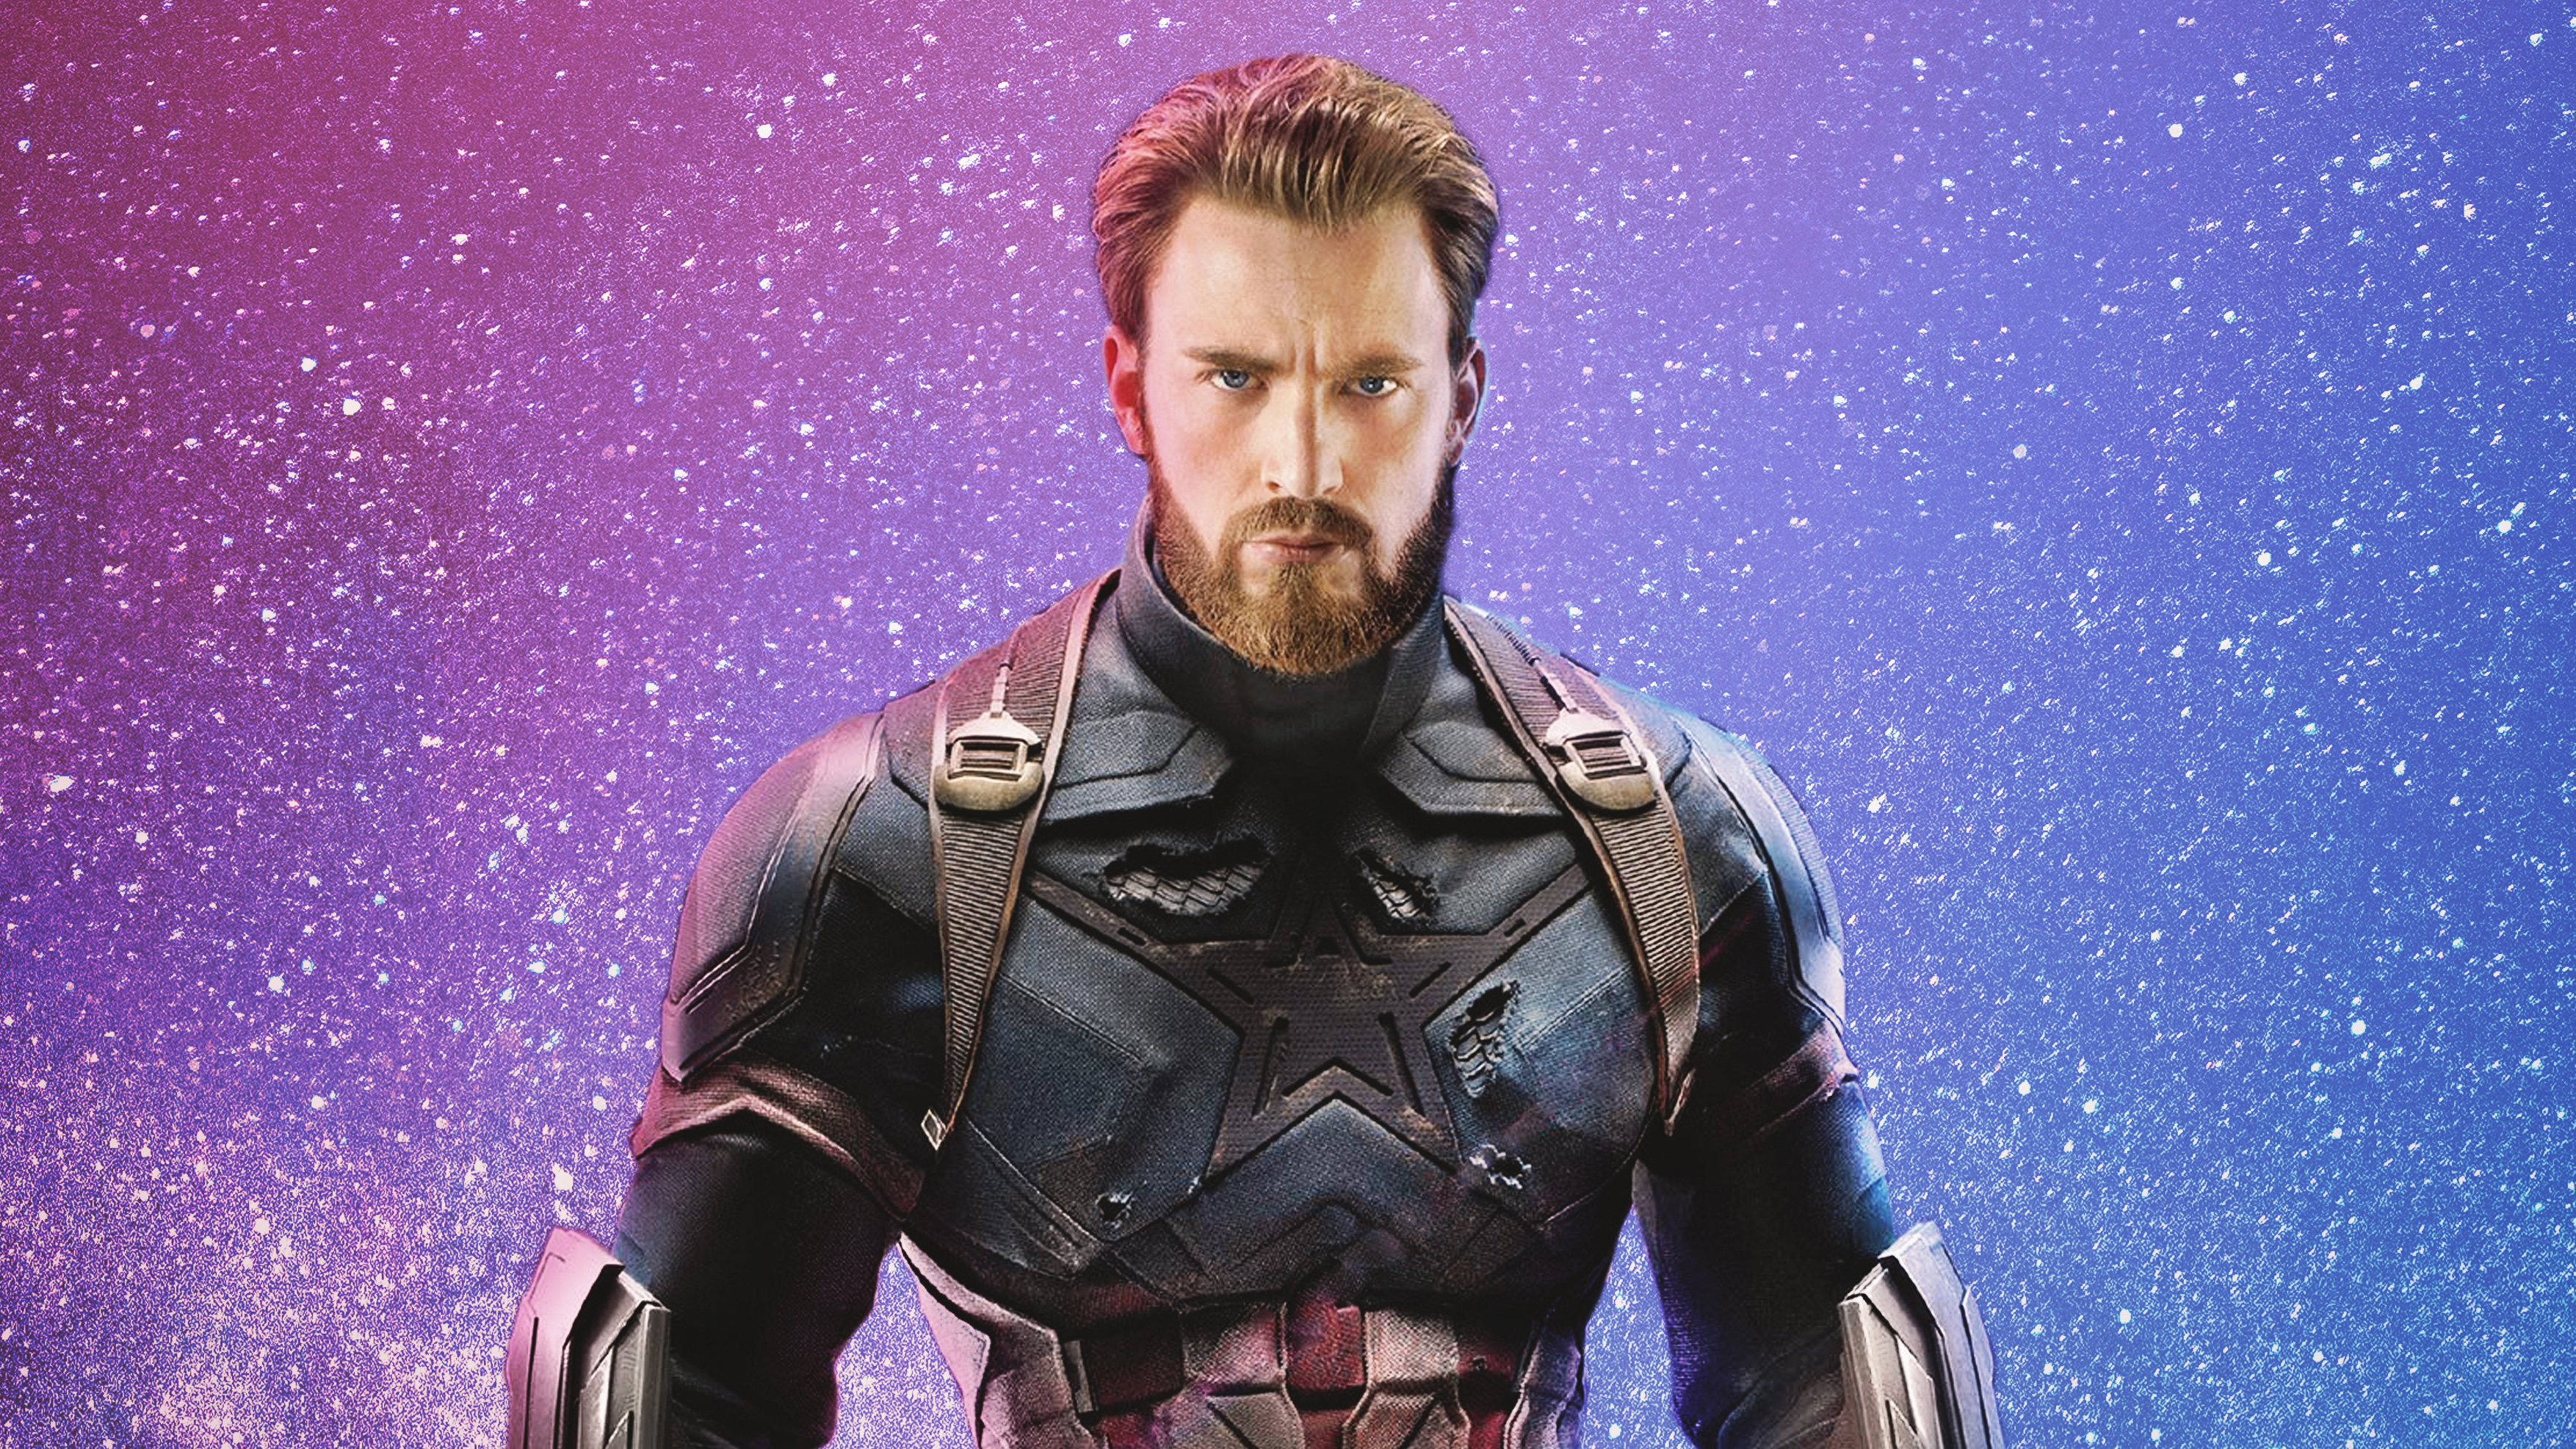 Captain America HD Wallpaper Background Image 3508x1973 ID 3508x1973